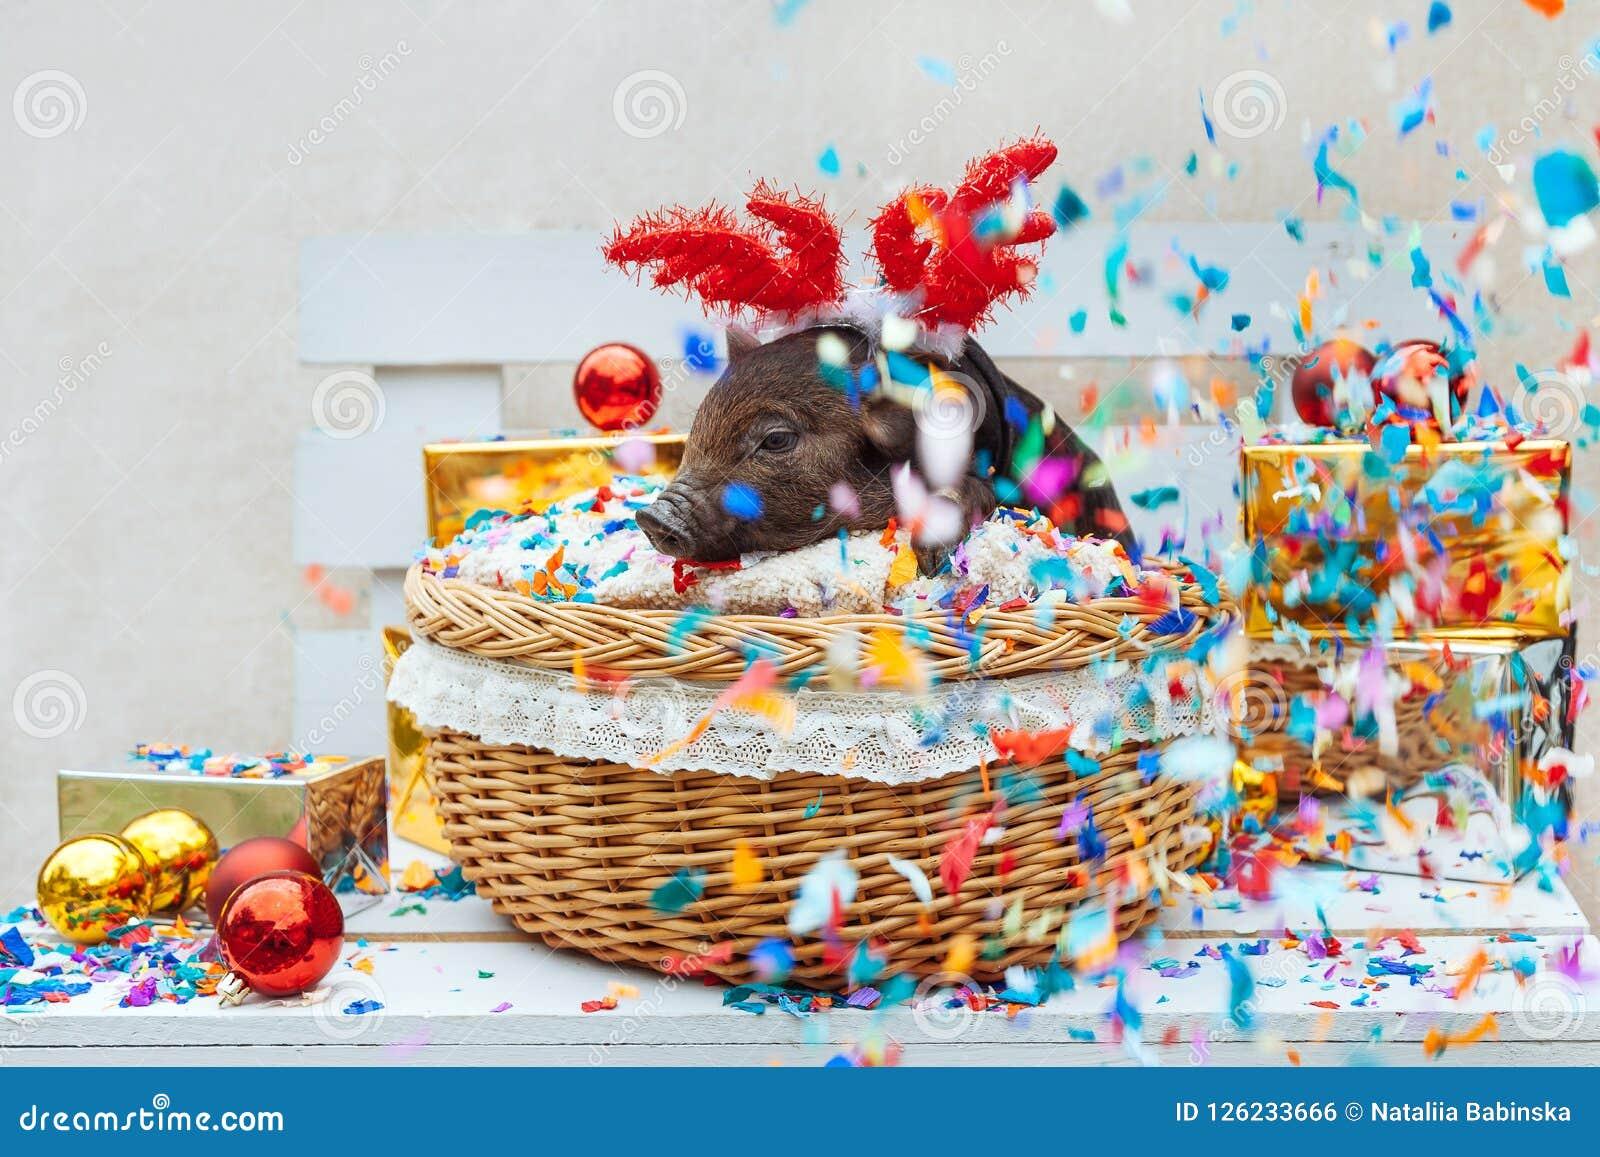 Download Pig Piglet Little Black Basket Wicker Cute Vietnamese Breed New Year Happy Christmas Tree Decorations